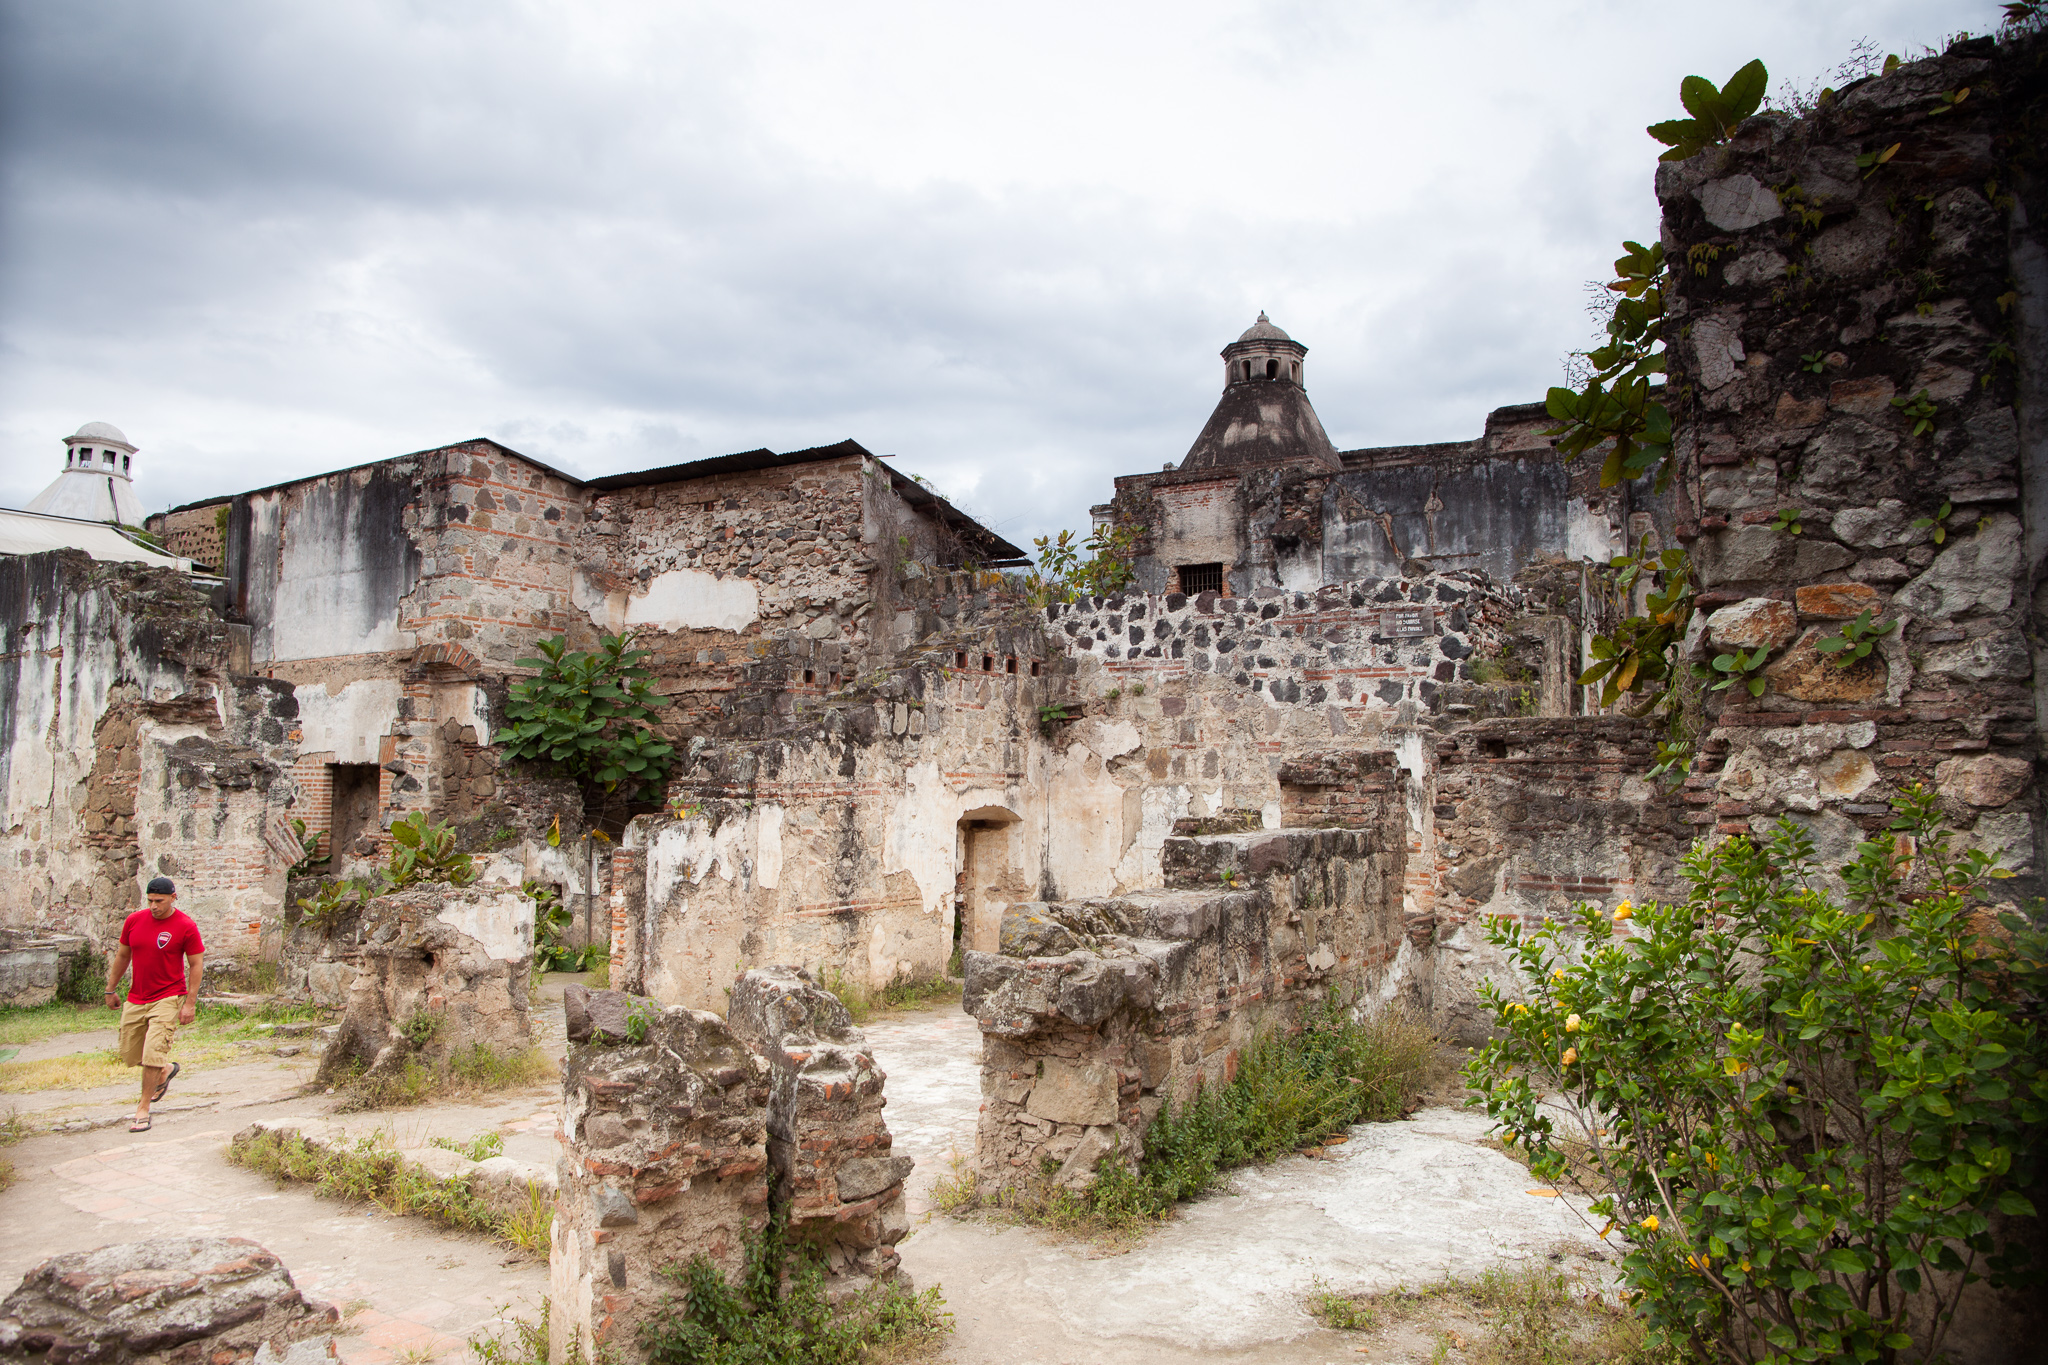 Guatemala-CP-160804-021.jpg